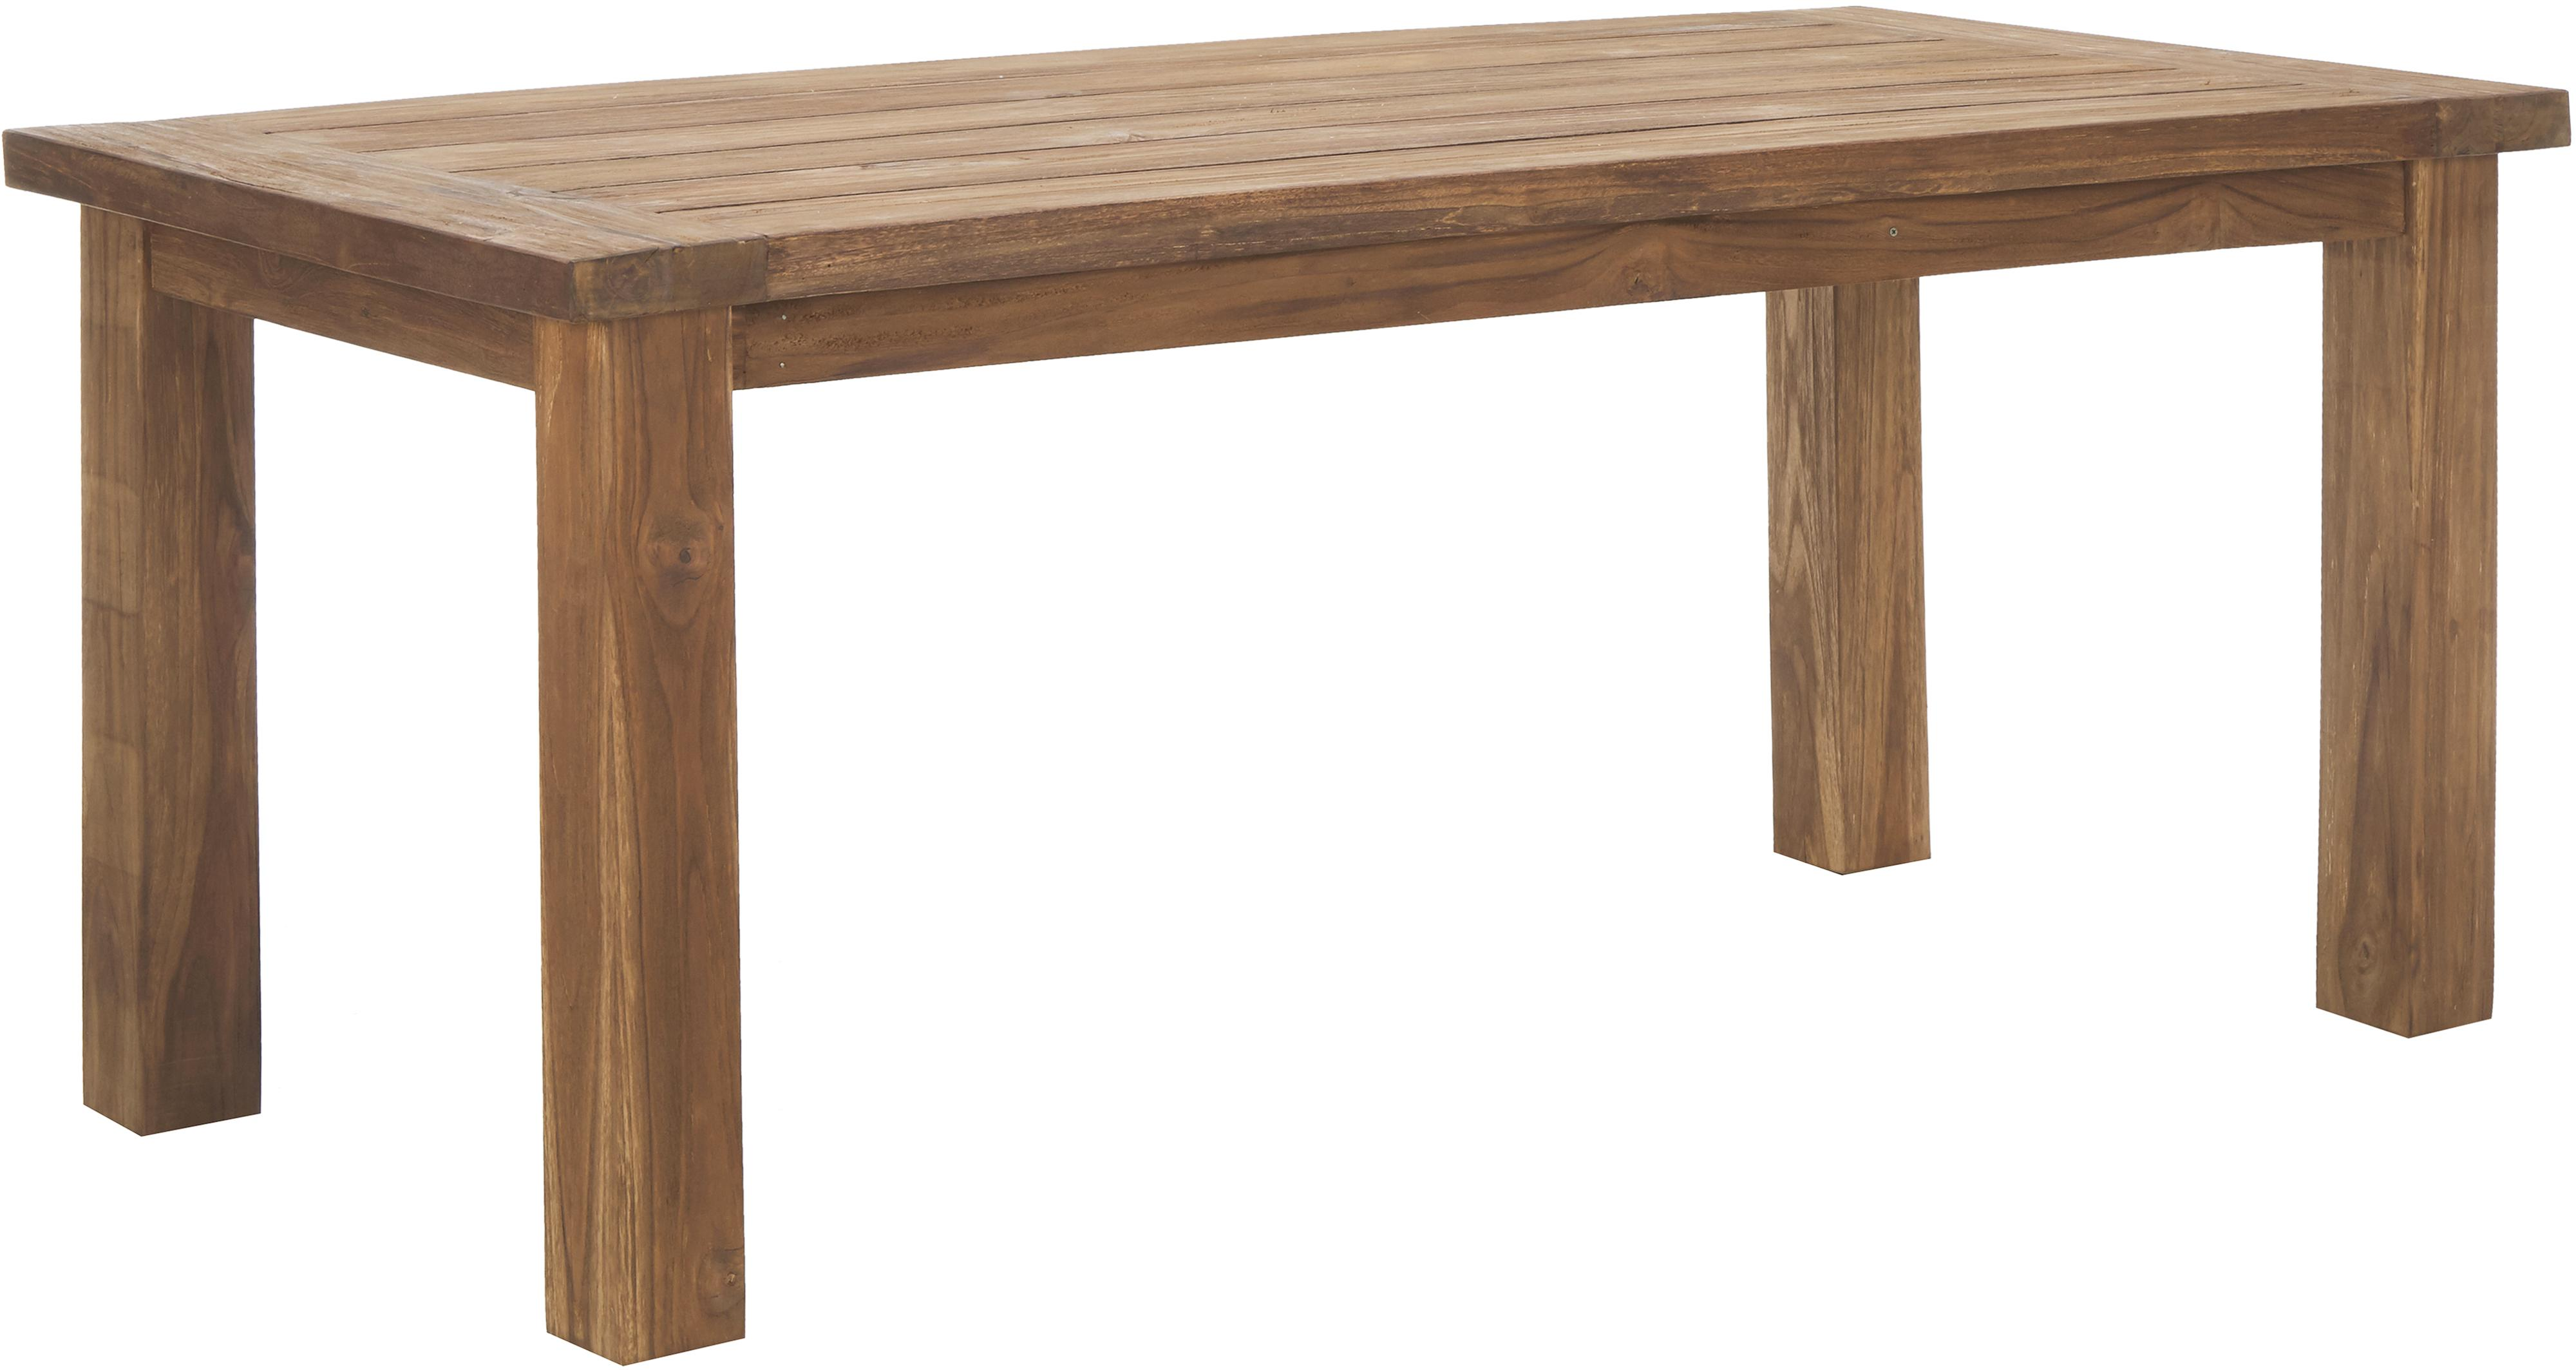 Mesa de comedor de madera maciza Bois, Madera de teca maciza sin tratar, Teca, An 180 x F 90 cm